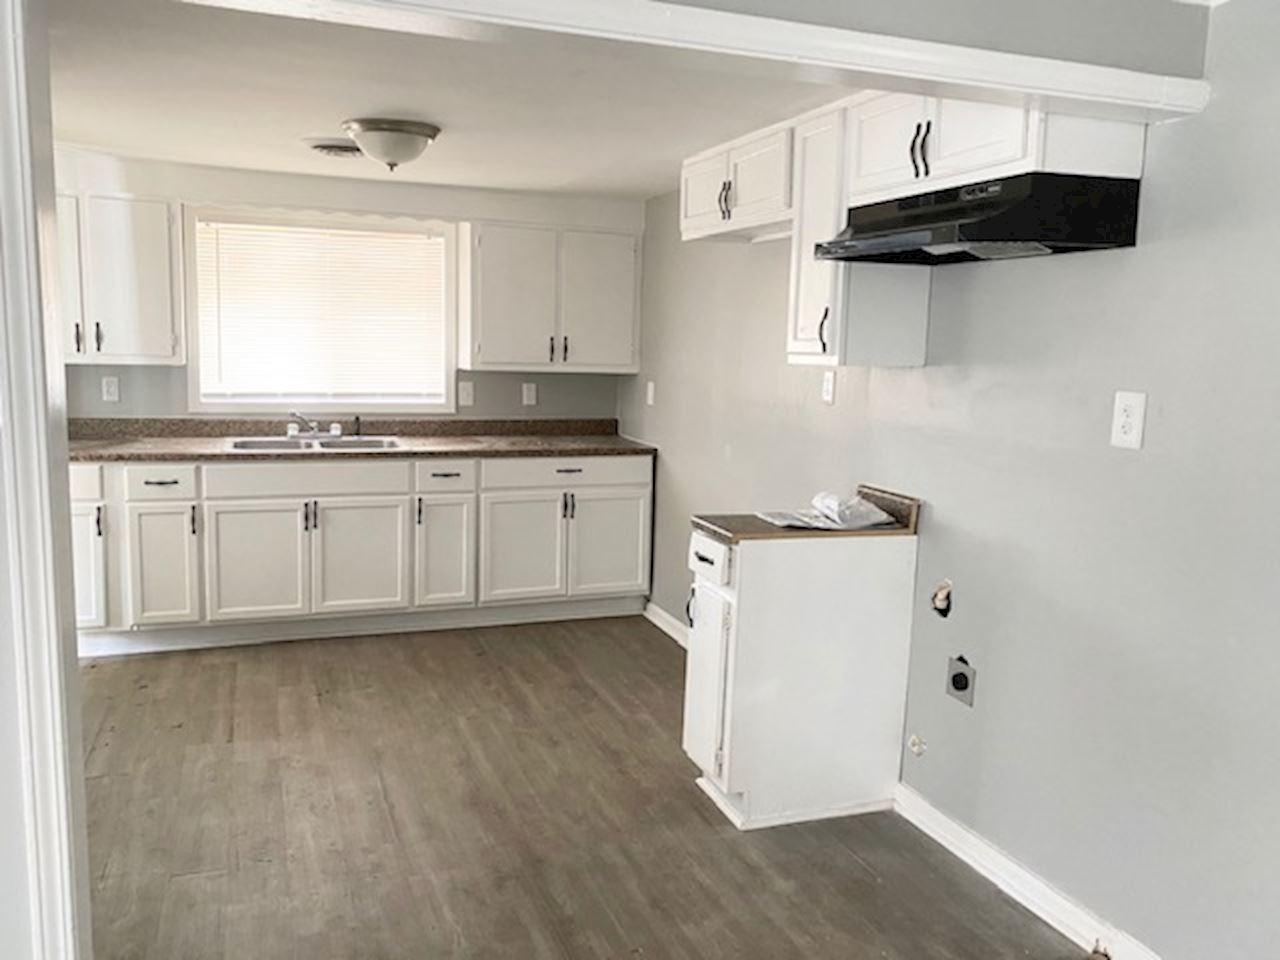 investment property - 2714 Nix Cv, Memphis, TN 38127, Shelby - image 2